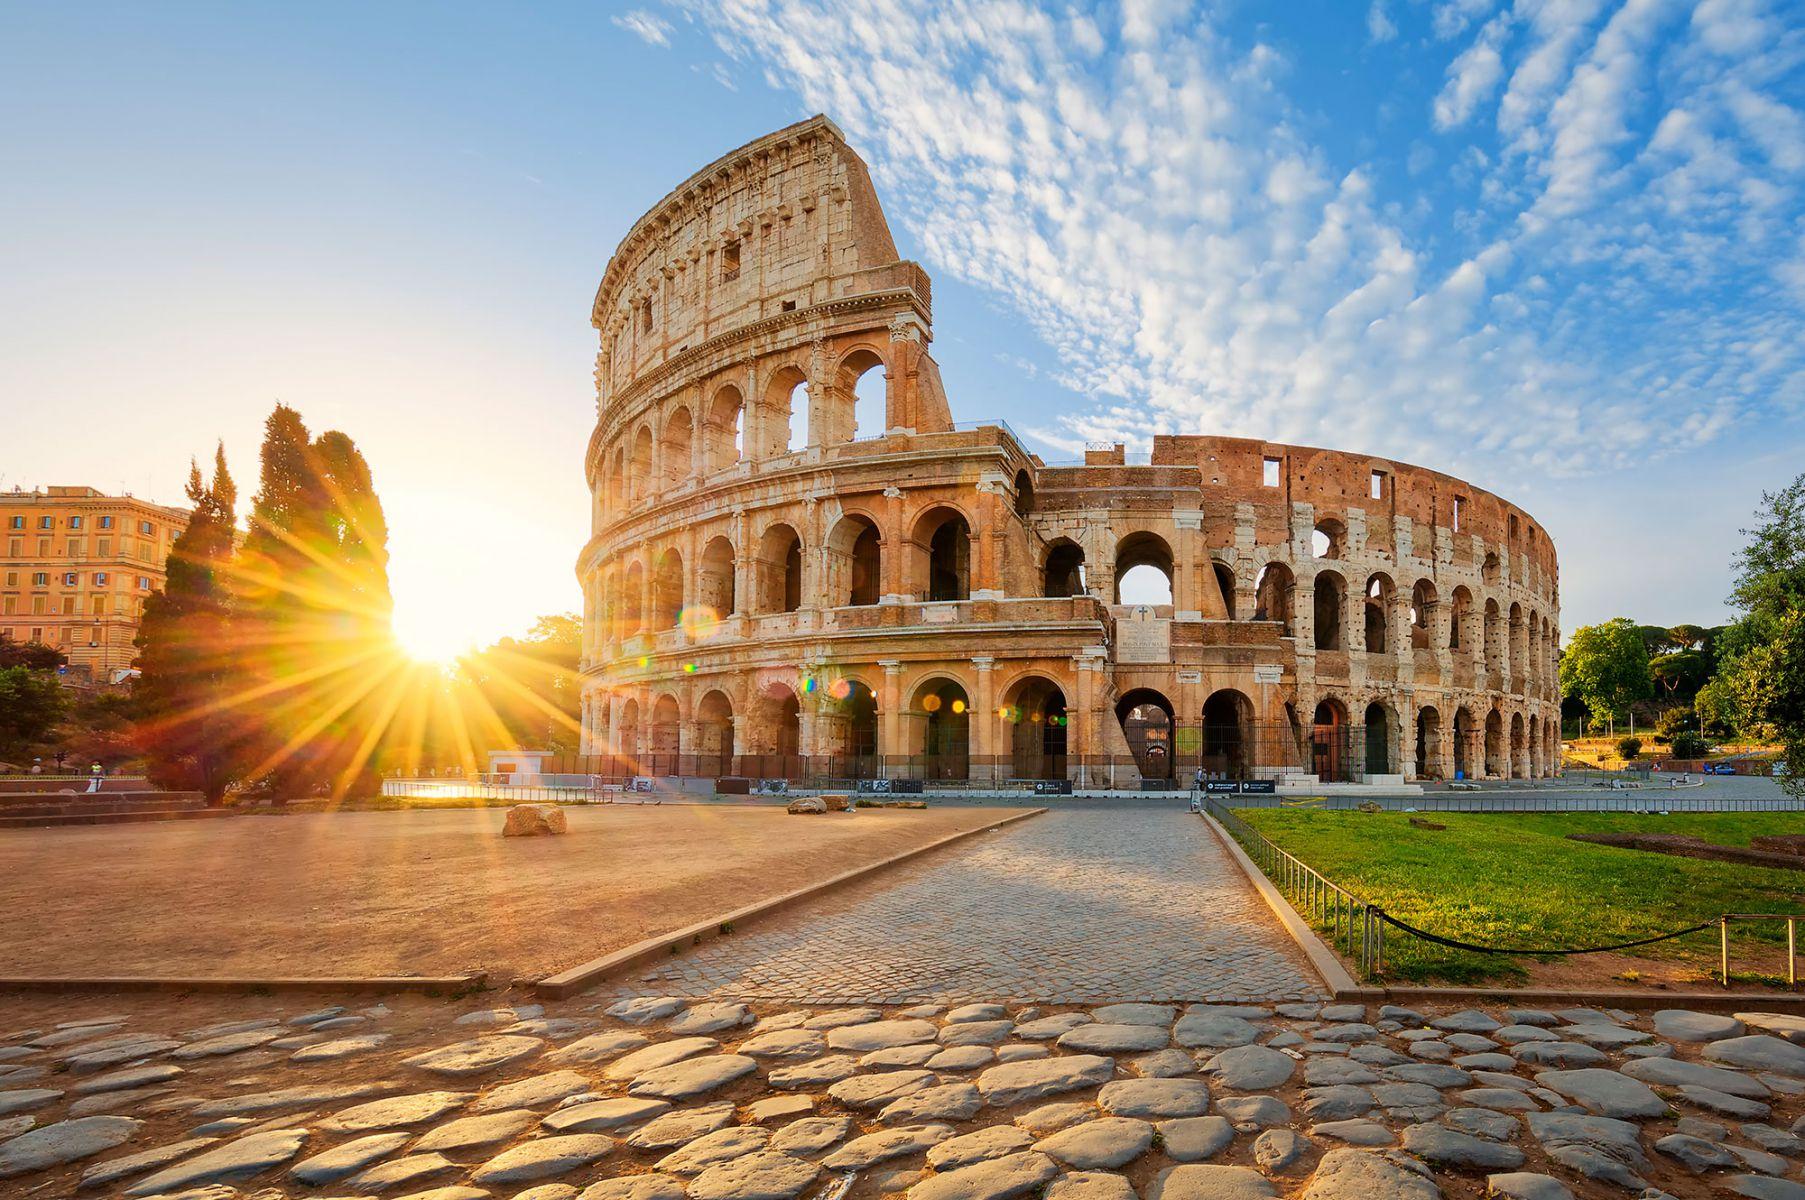 Zonsopgang bij het Colosseum in Rome, Italië